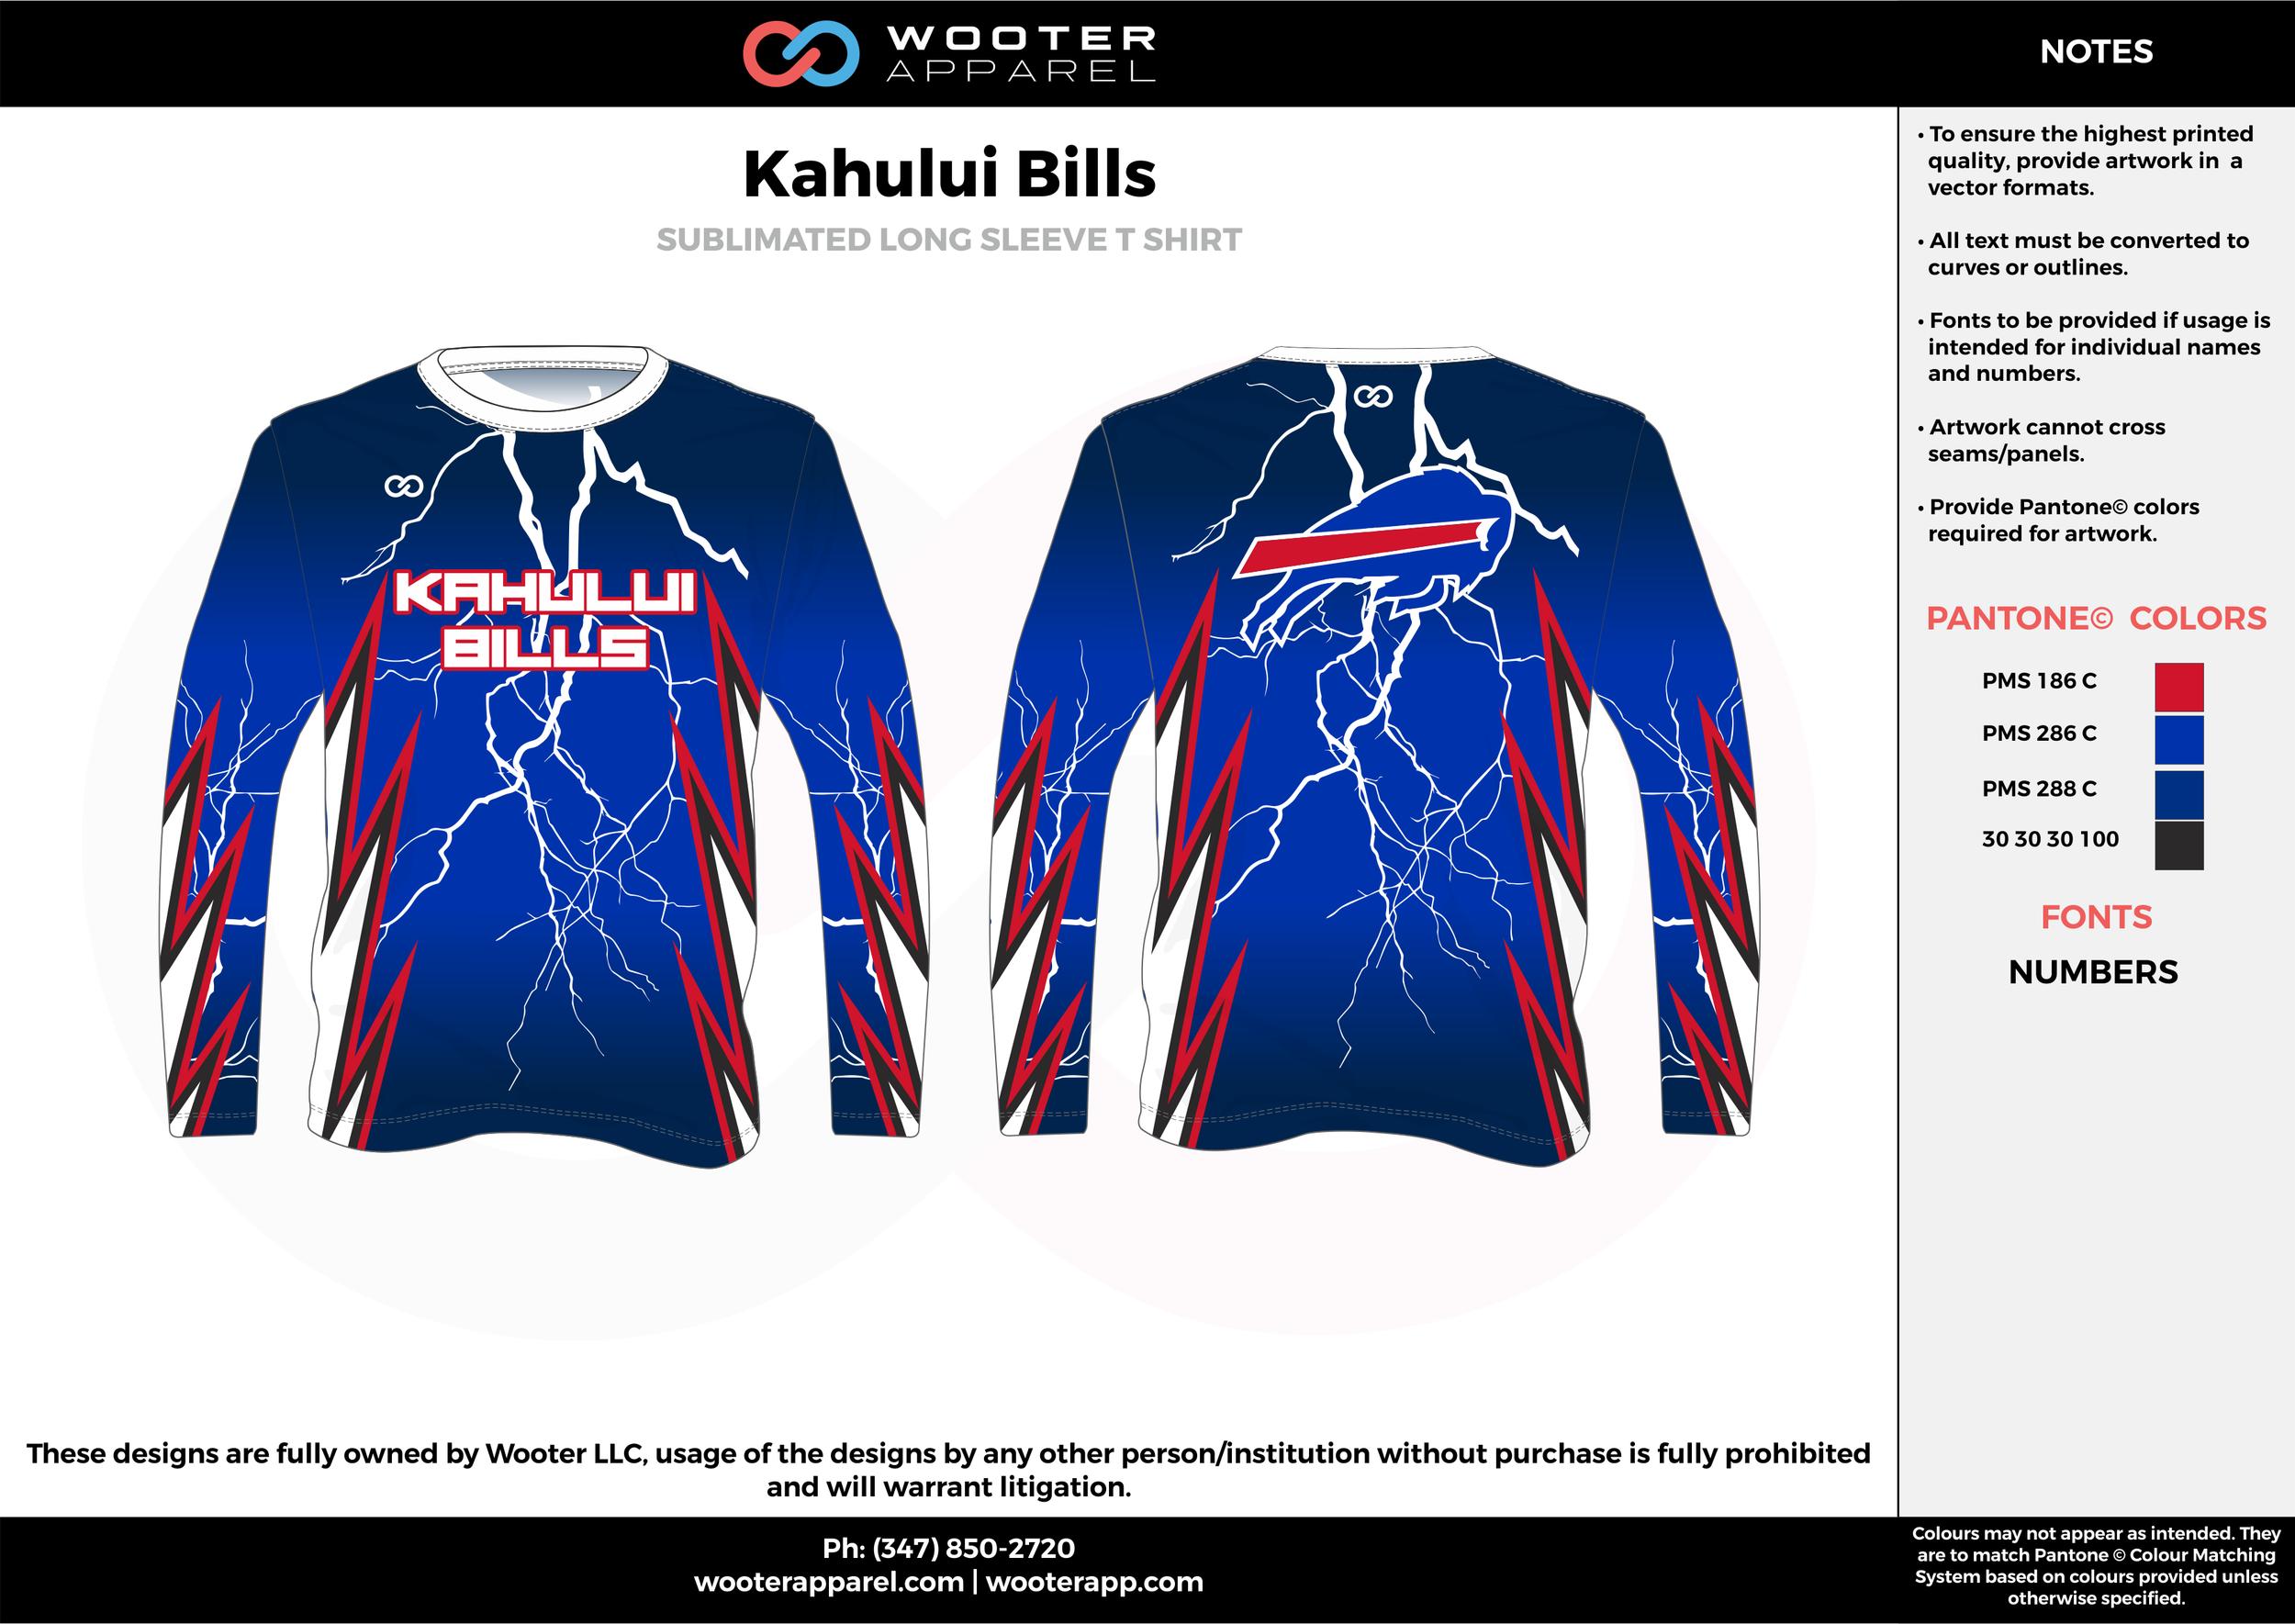 KAHULUI BILLS blue red black flag football uniforms jerseys long sleeve